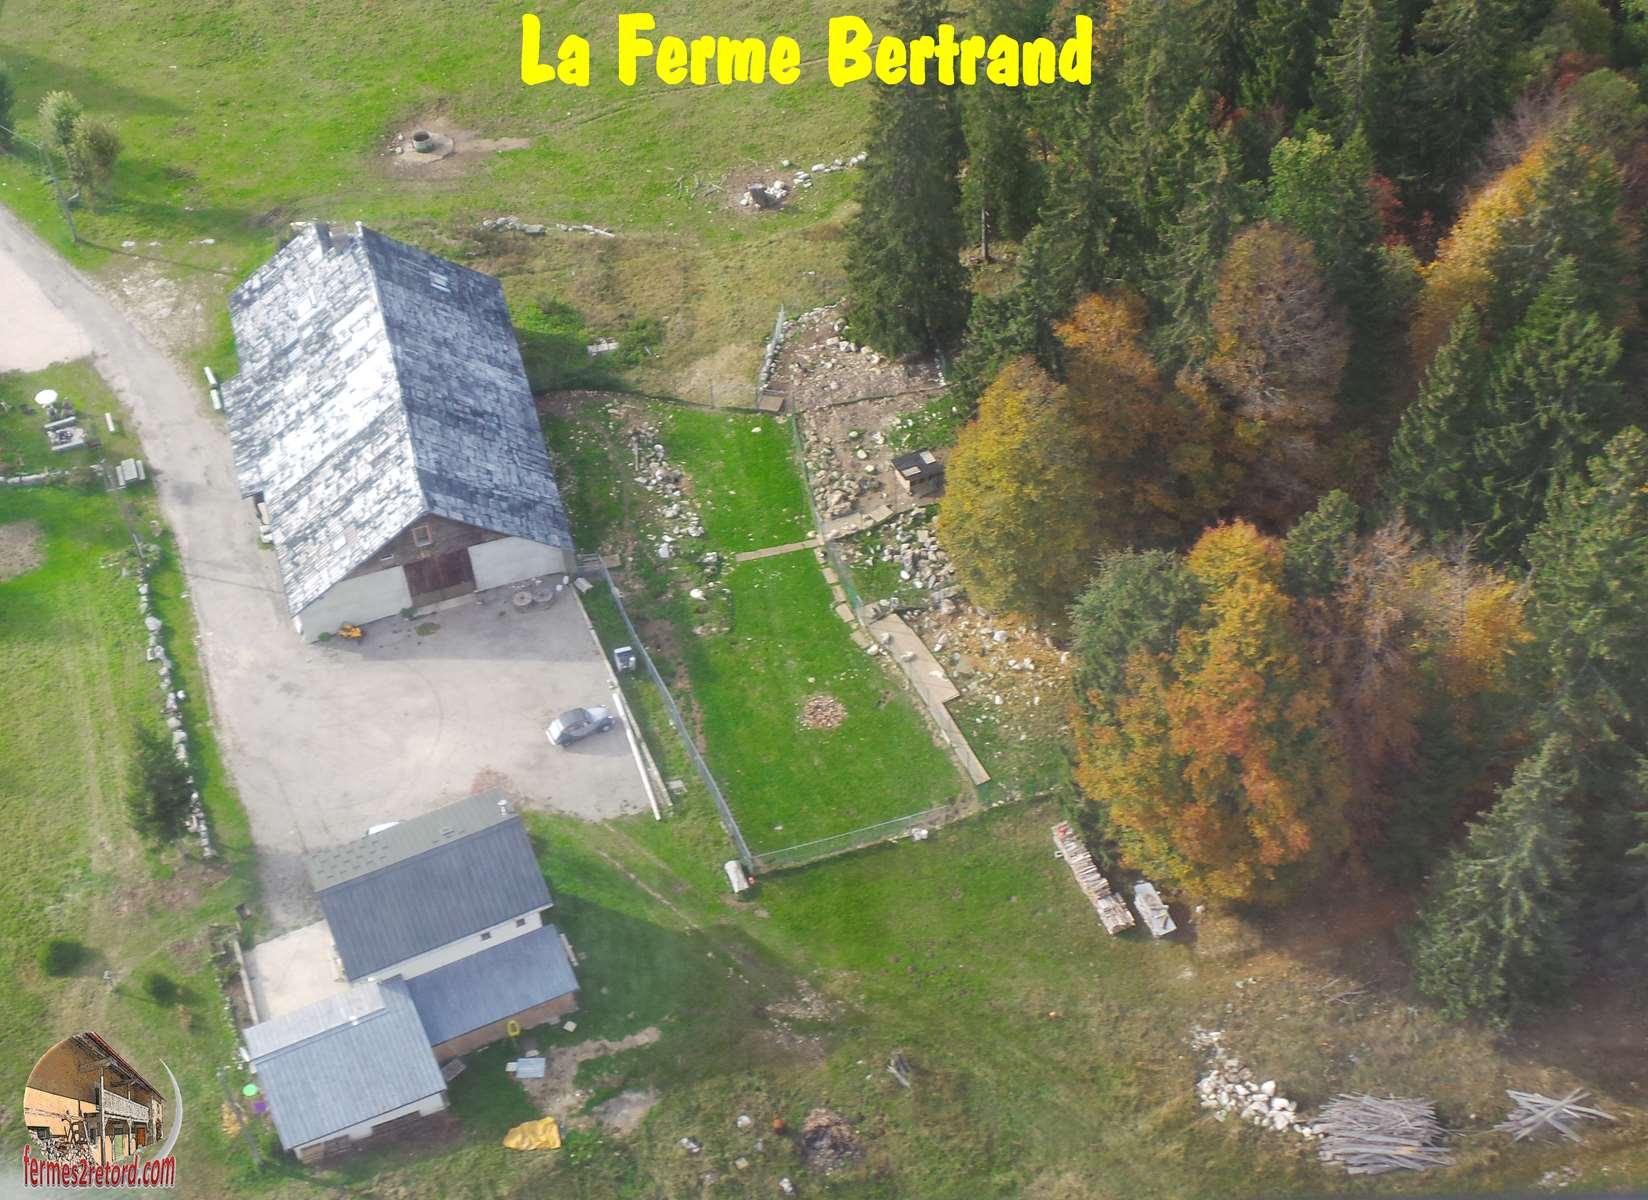 La Ferme Bertrand.jpg